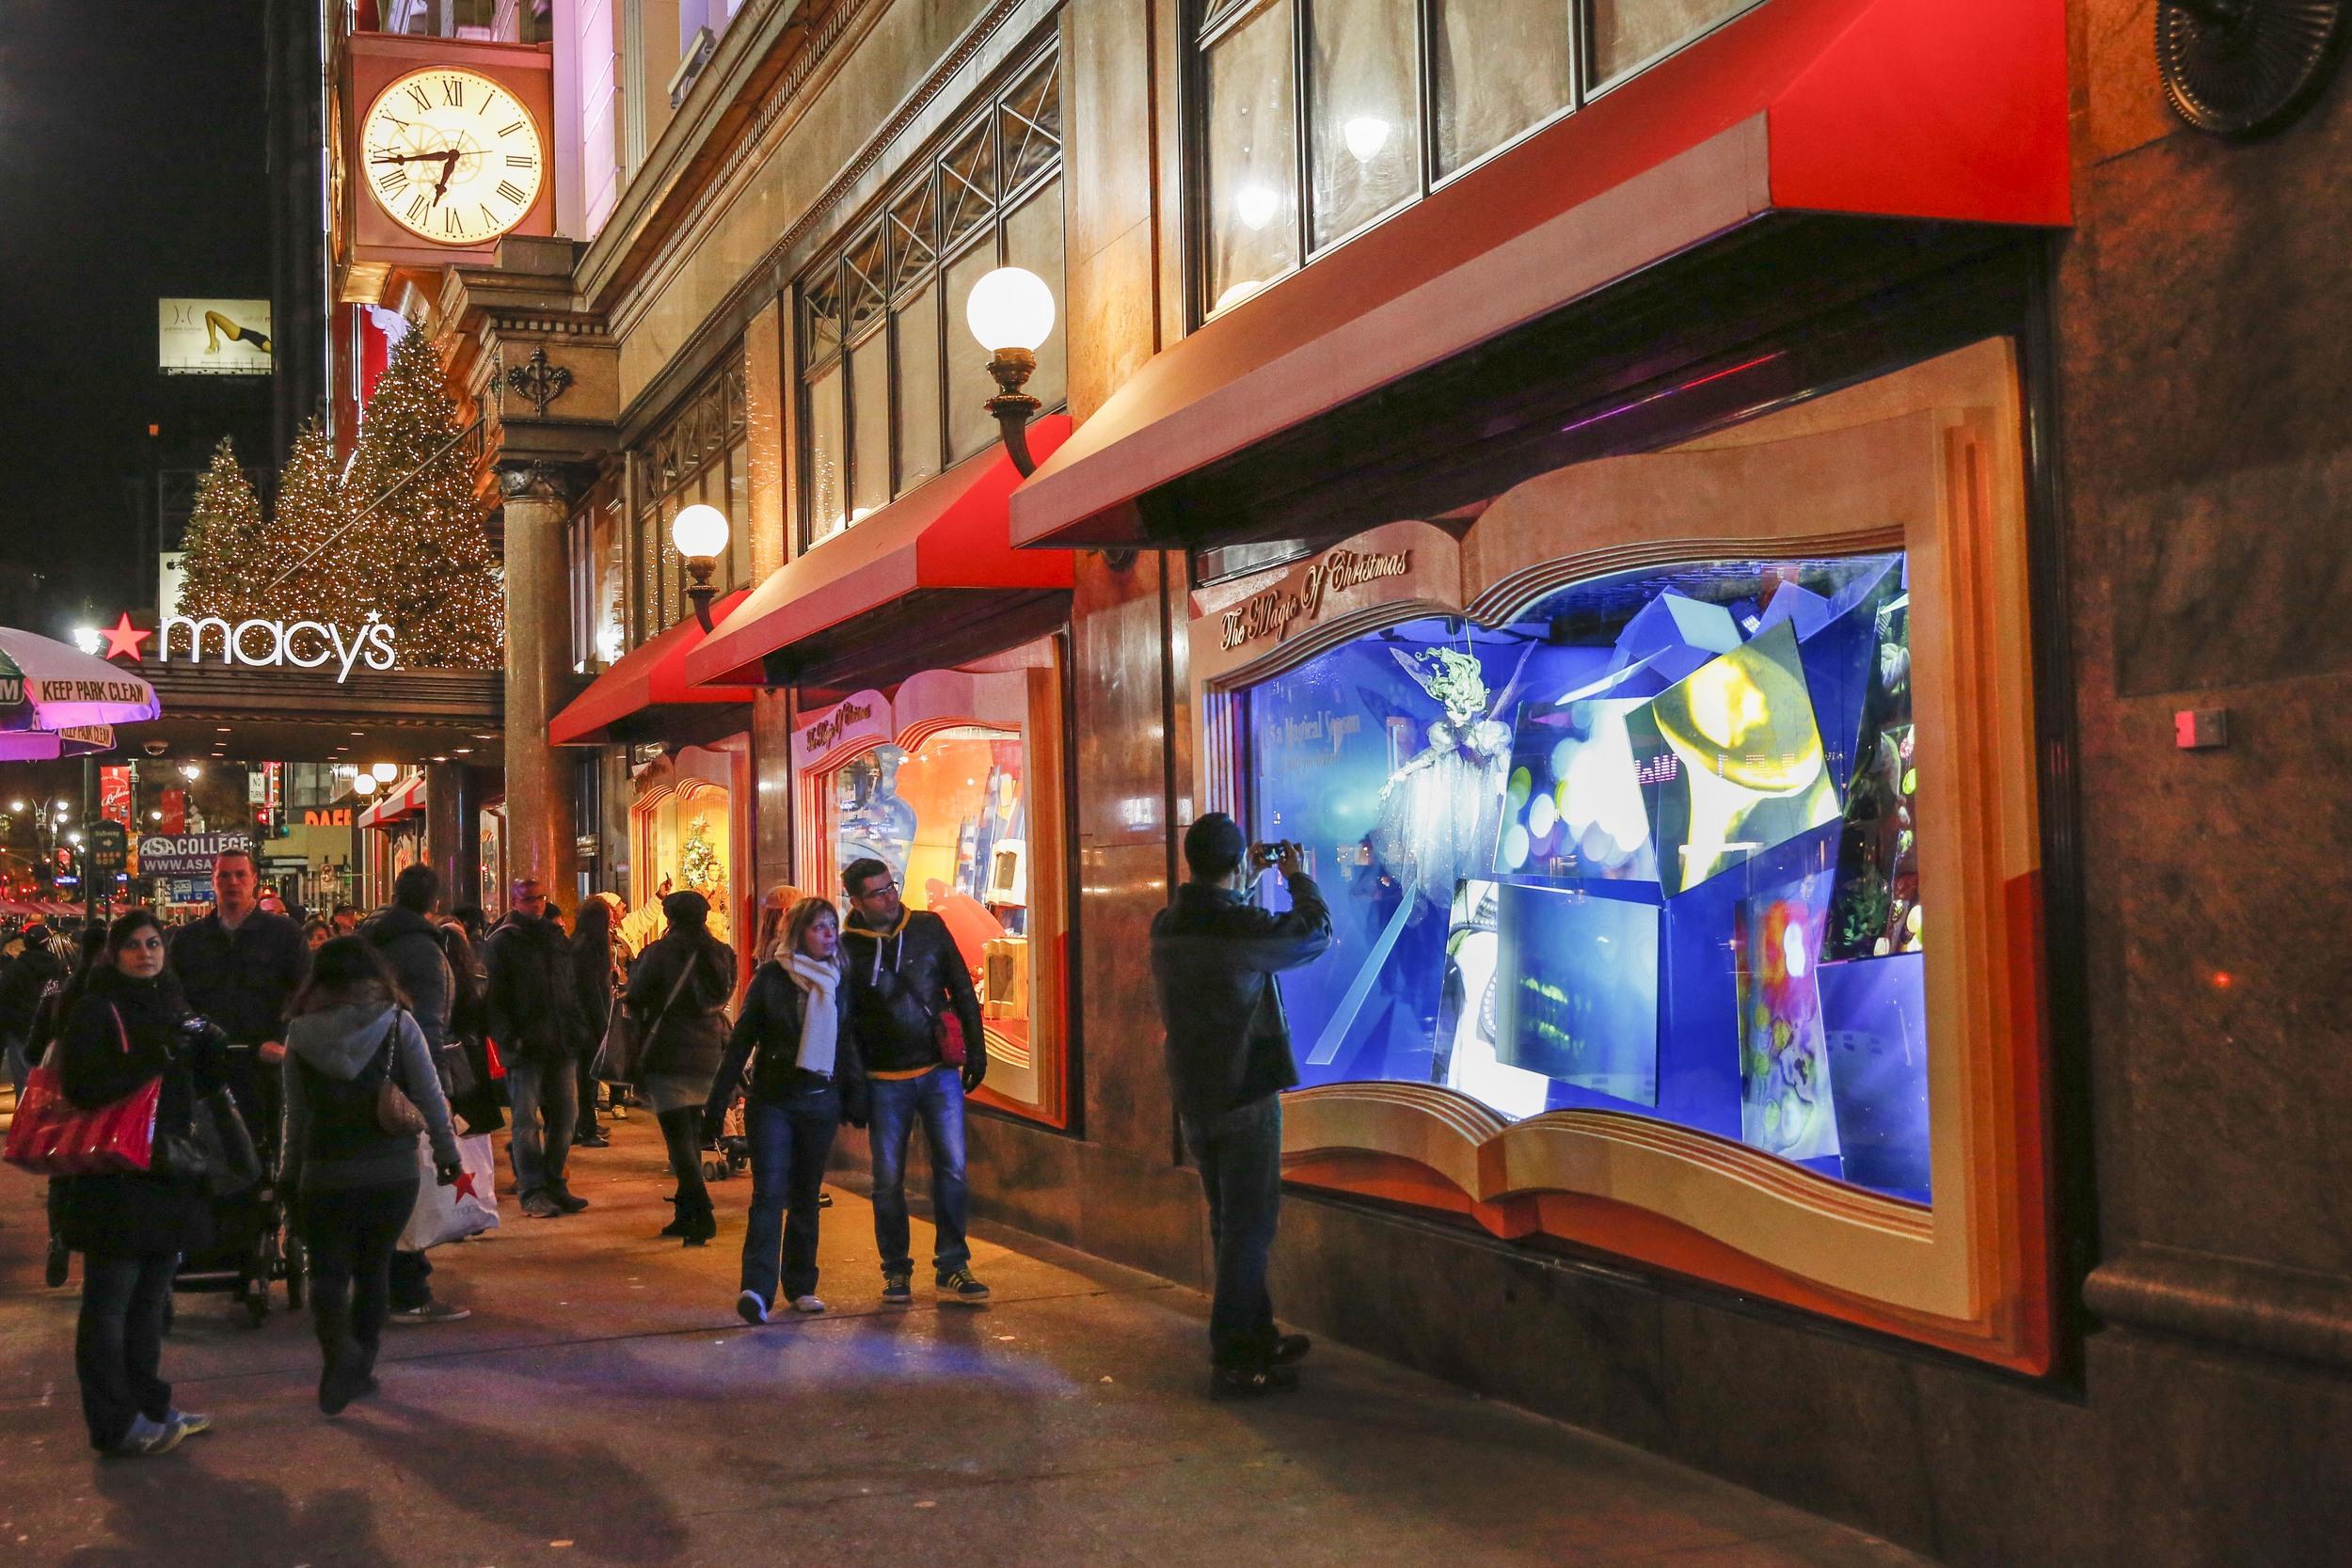 Macy's Herald Square Christmas Display.